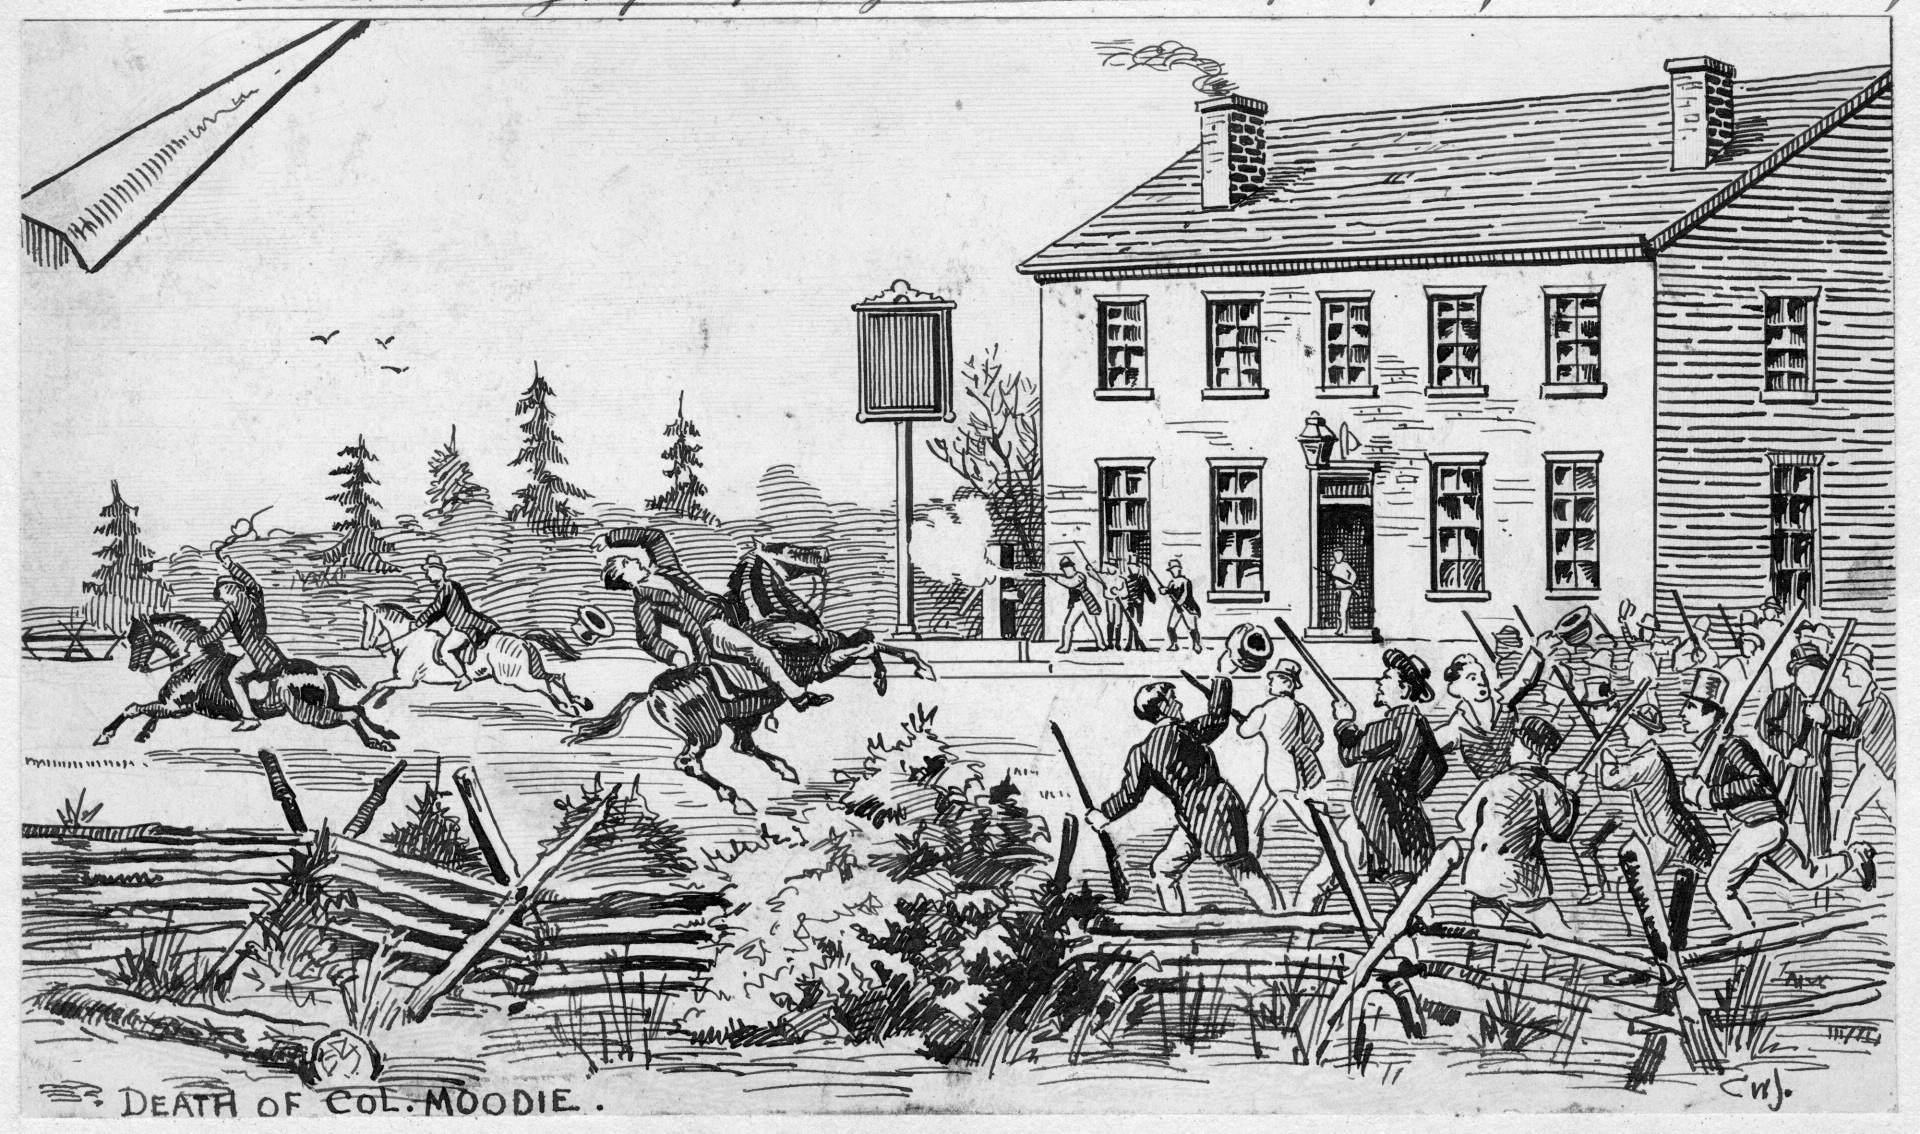 Shooting of Col. Robert Moodie, Montgomery's Tavern, Toronto by Charles  William Jefferys. (December 4, 1837).